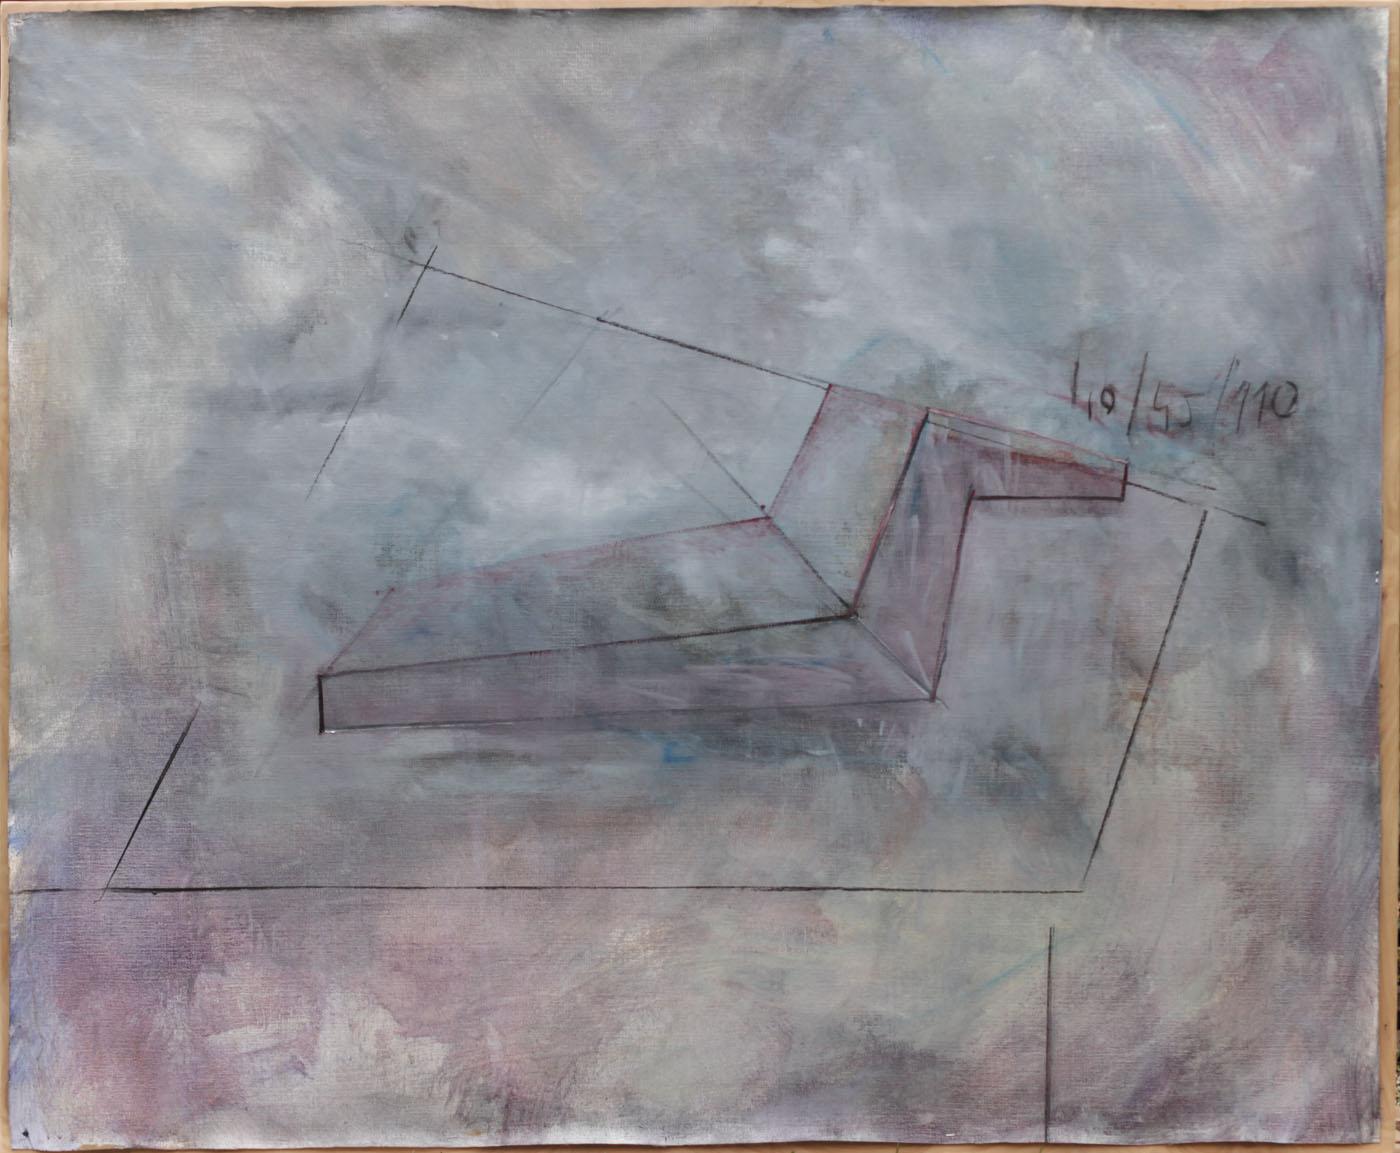 Chaise Longue 2012, 123x152cm, oil on canvas